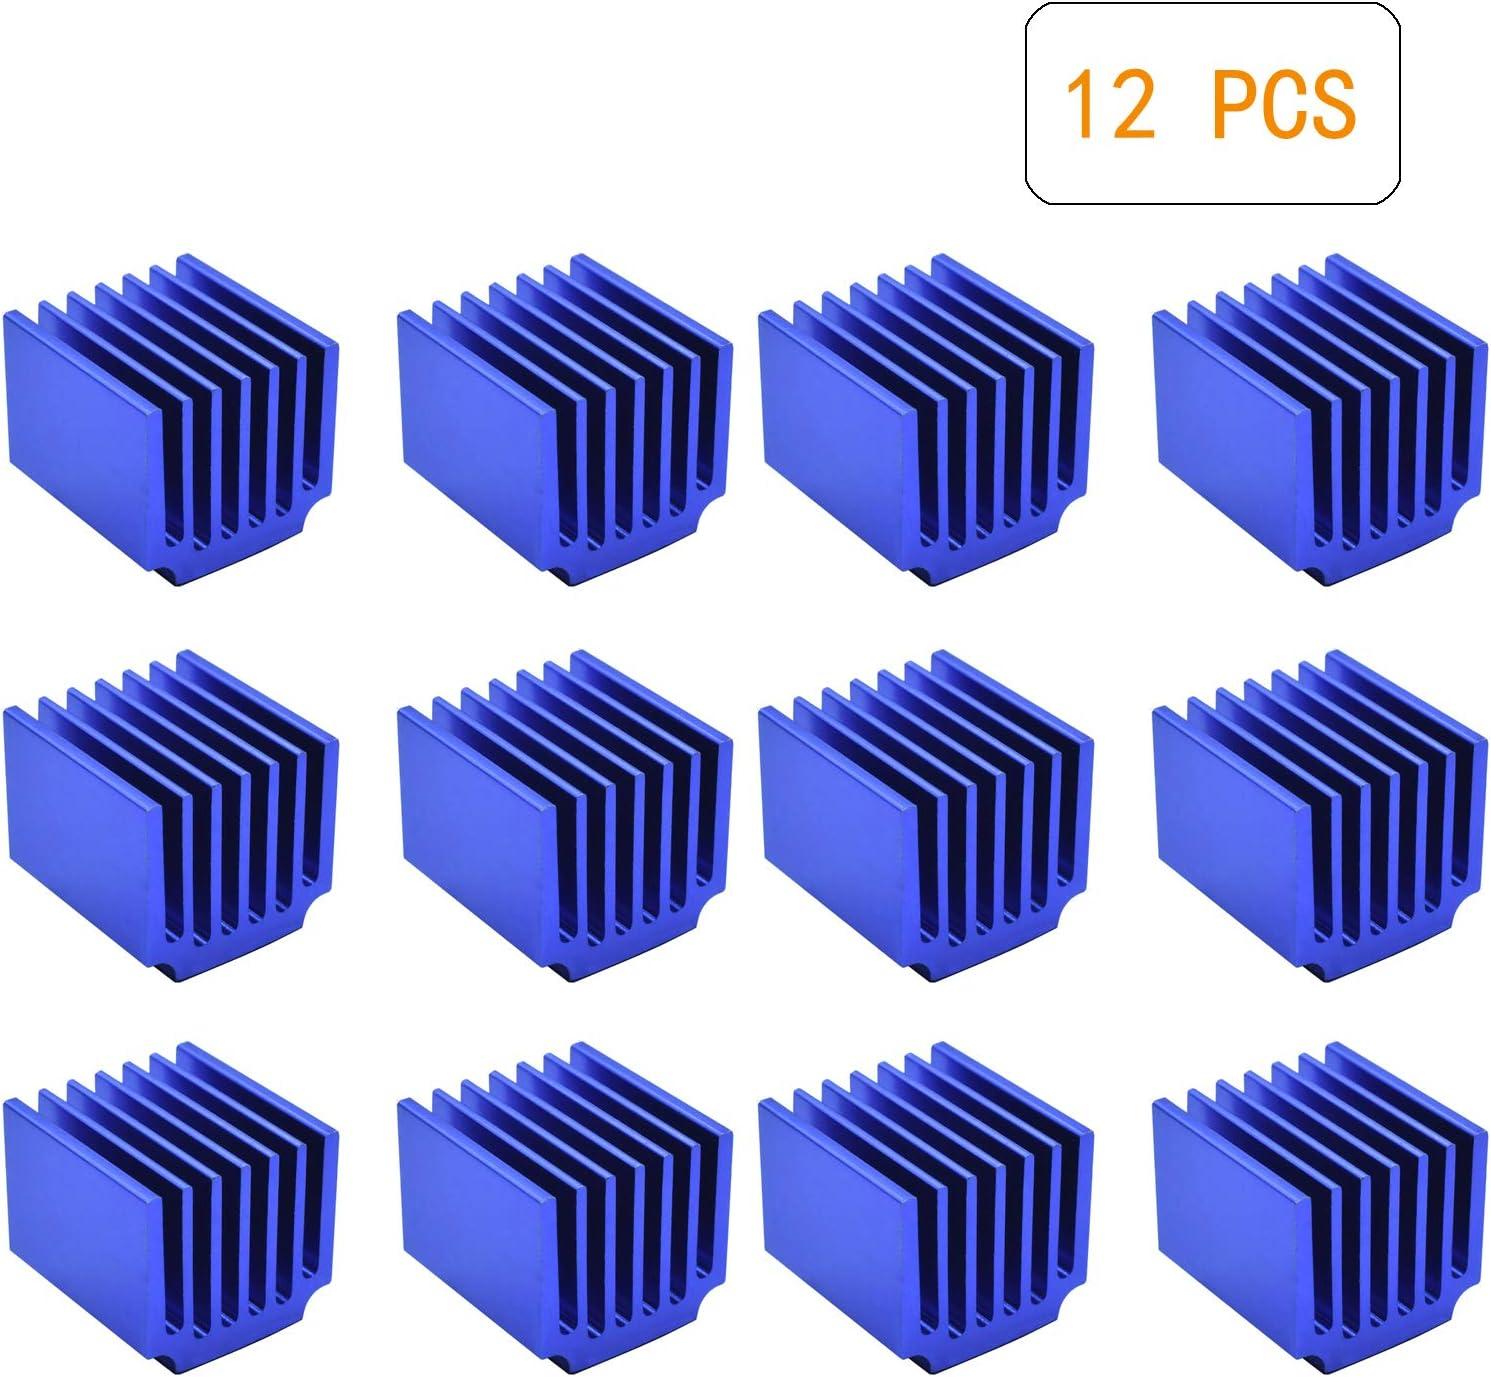 12 Pcs Stepper Motor Driver Heatsink, 3D Printer Parts Driver Heat Sink Aluminum Heatsinks Cooling Fin Drivers for Raspberry Pi LV8729 A4988 DRV8825 TMC2208 TMC2100 TMC2130 Driver, Blue